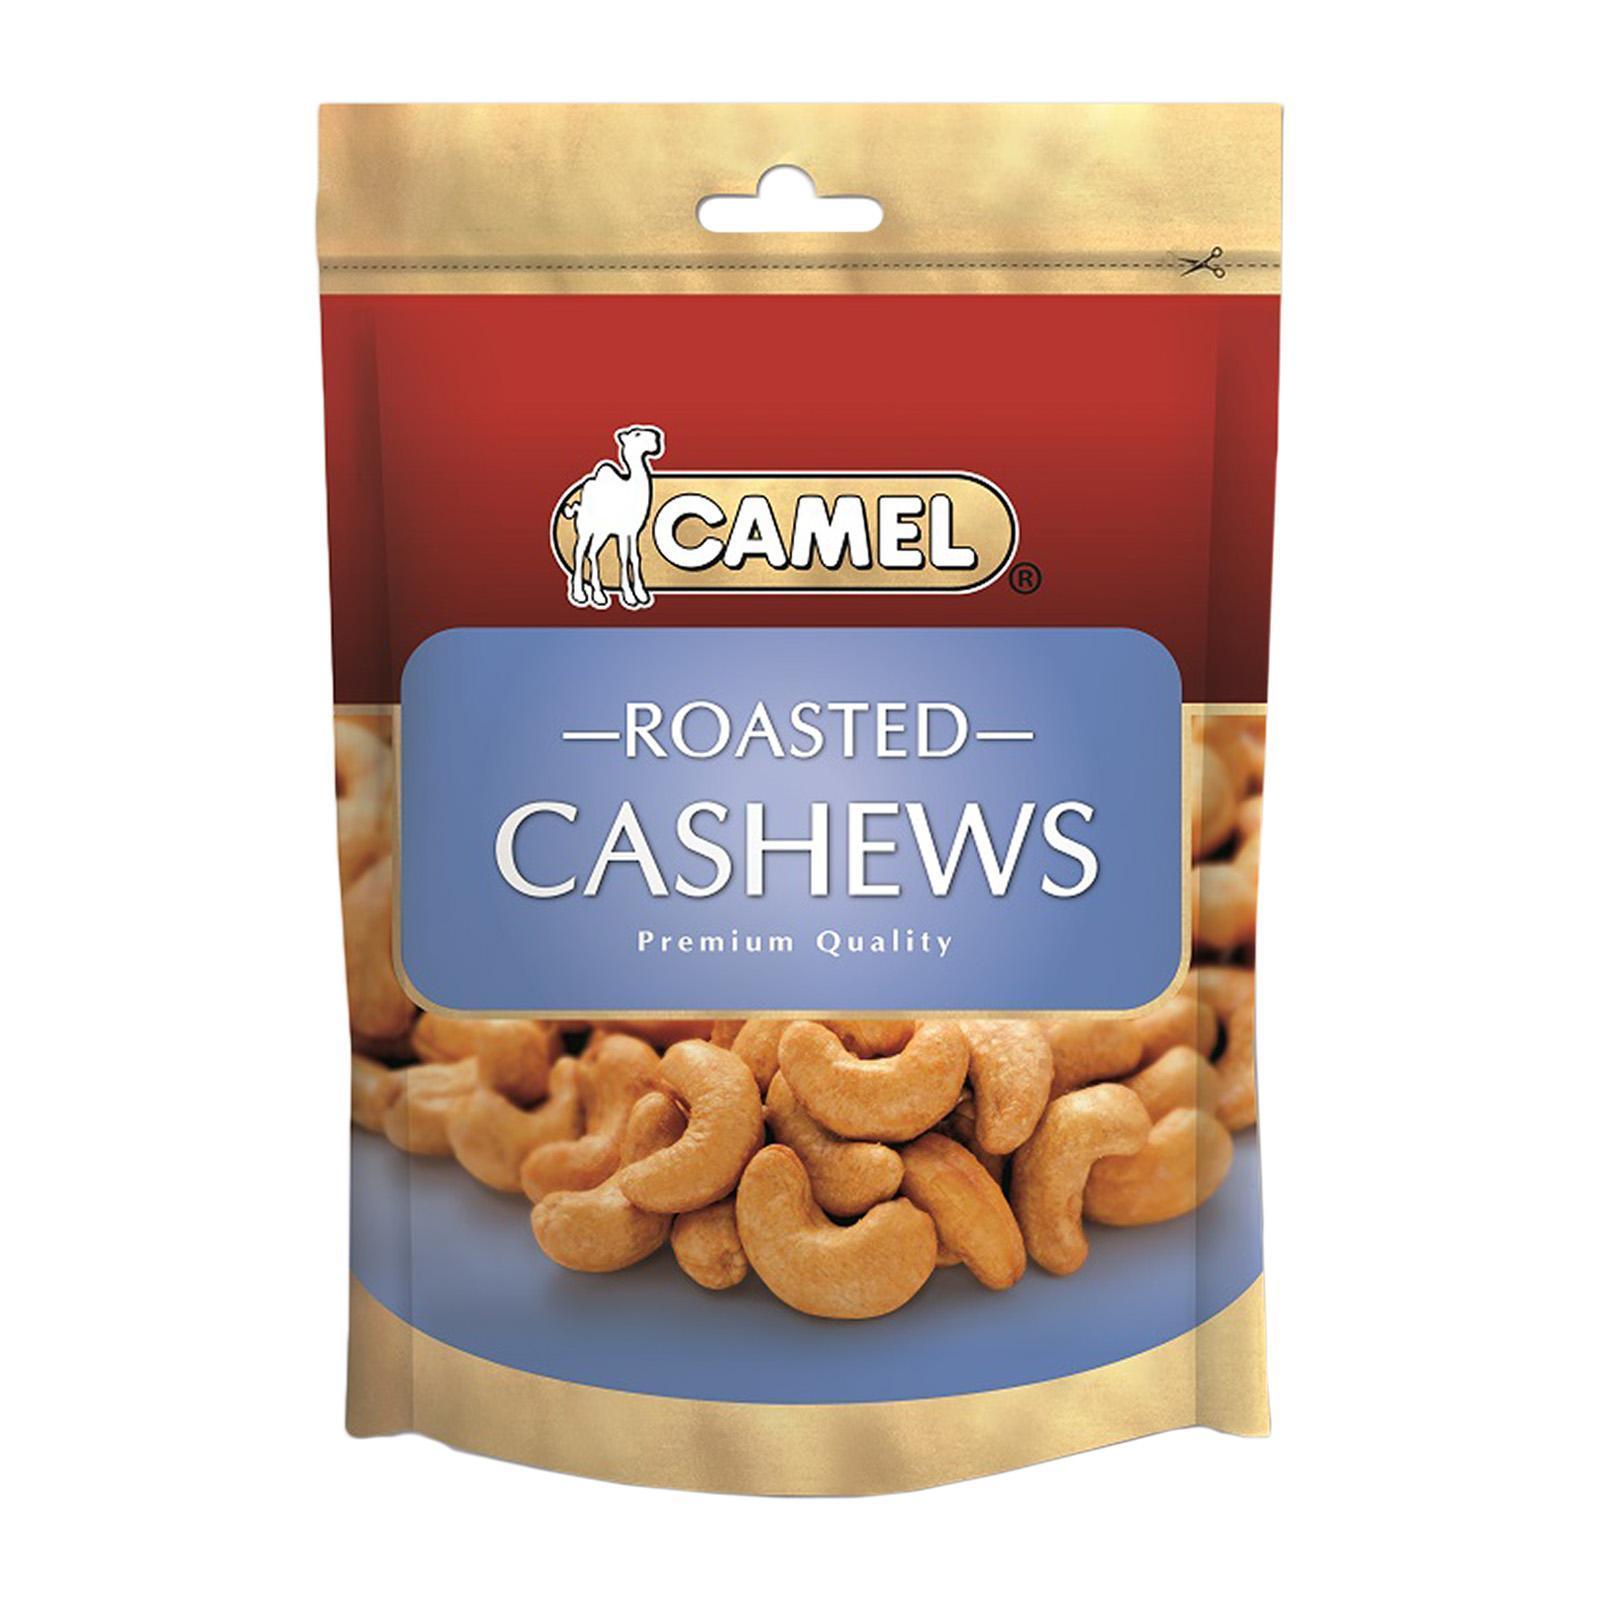 CAMEL Roasted Cashew Nuts 400g